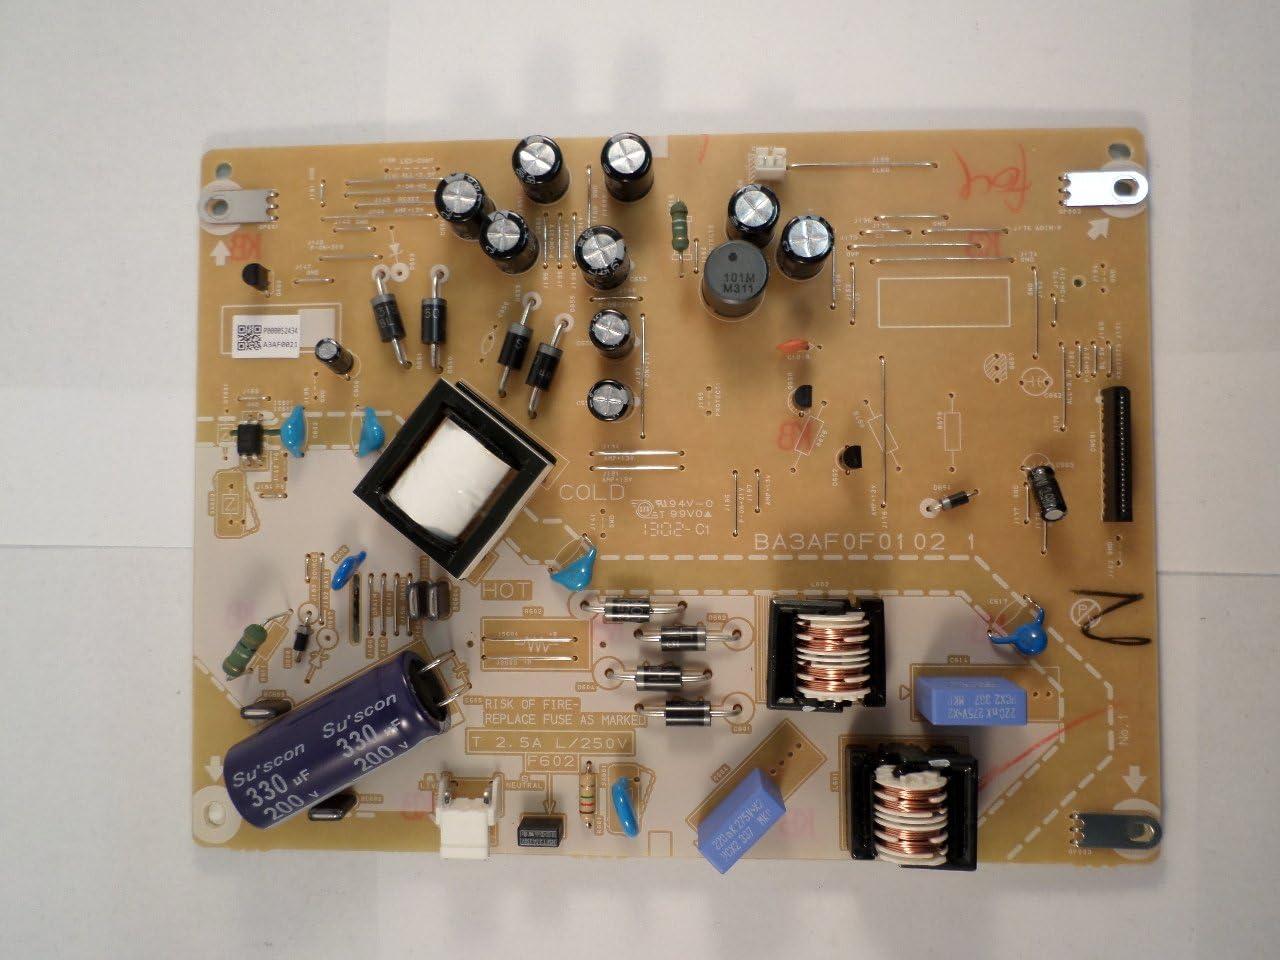 32 LF320EM4 A3AF0021 LED LCD Power Supply Board Unit Motherboard